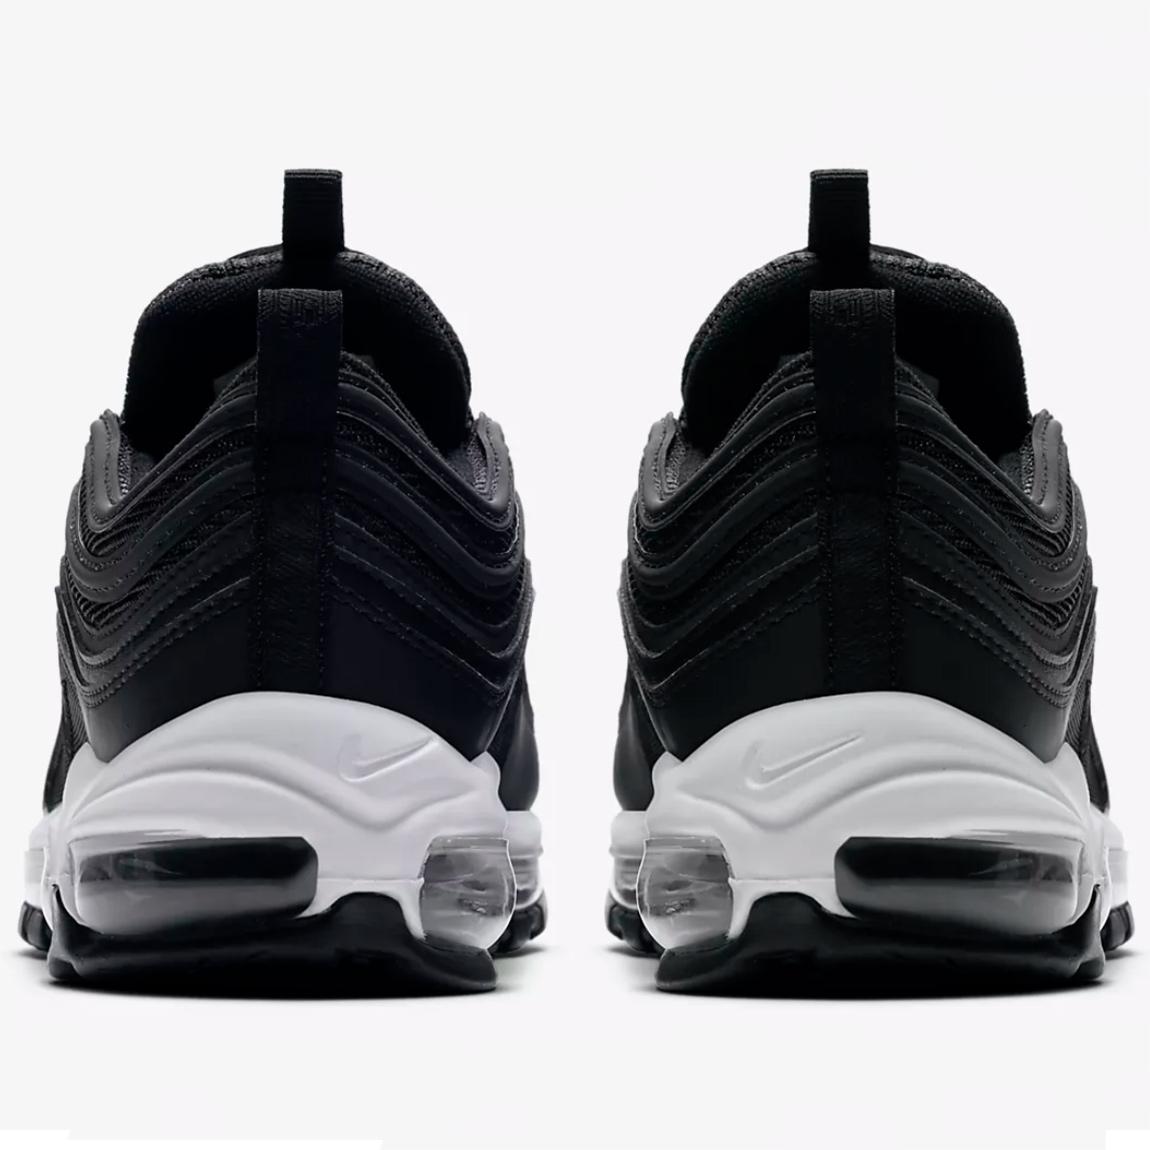 1251c401bf7f7b Nike W Air Max 97 Damen Sneaker schwarz weiß 921733 006 – Bild 4